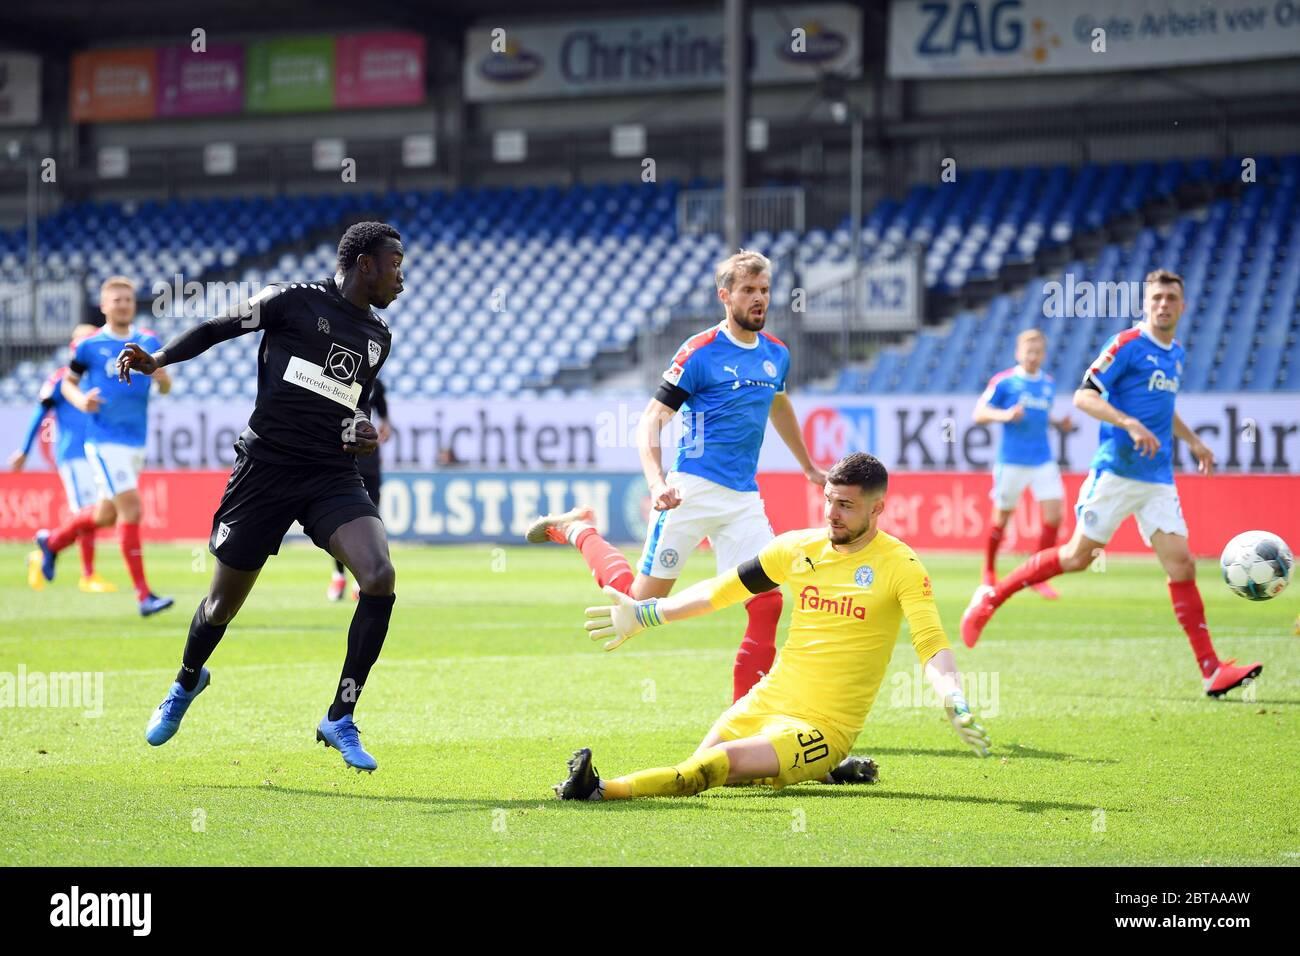 Kiel Germany 24th May 2020 Football 2nd Bundesliga Holstein Kiel Vfb Stuttgart 27th Matchday At The